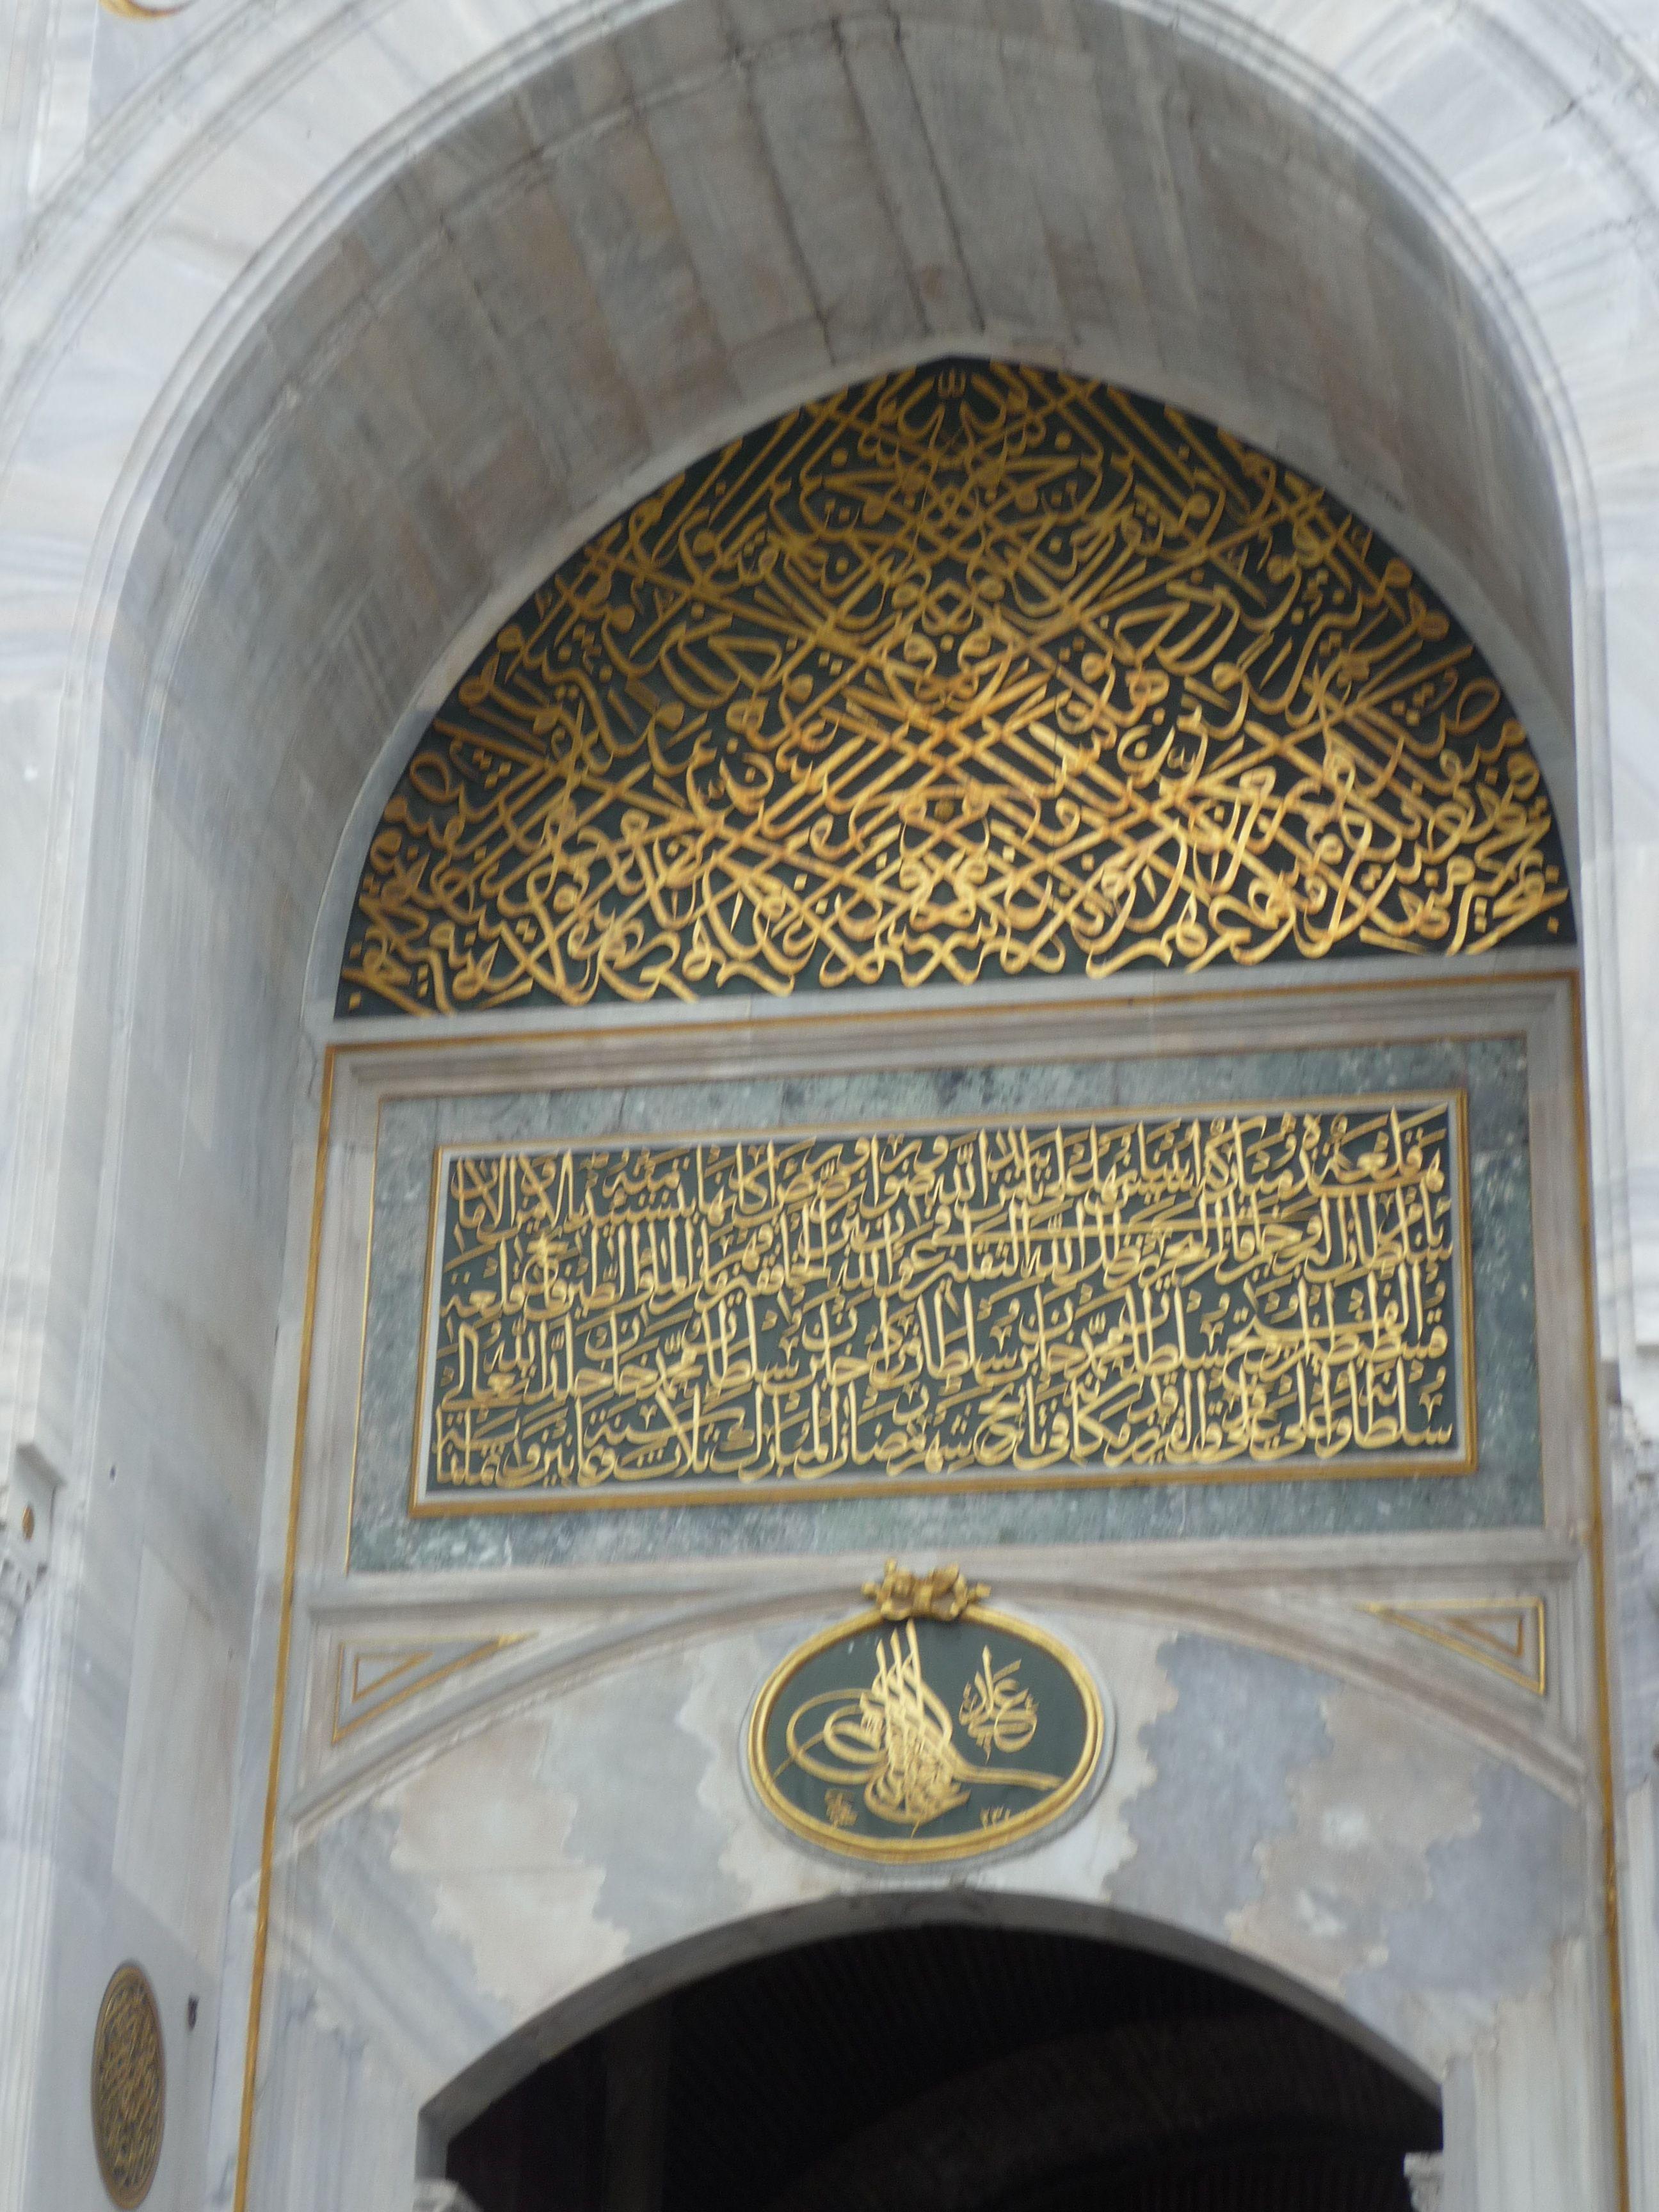 Topkapi Palace entry